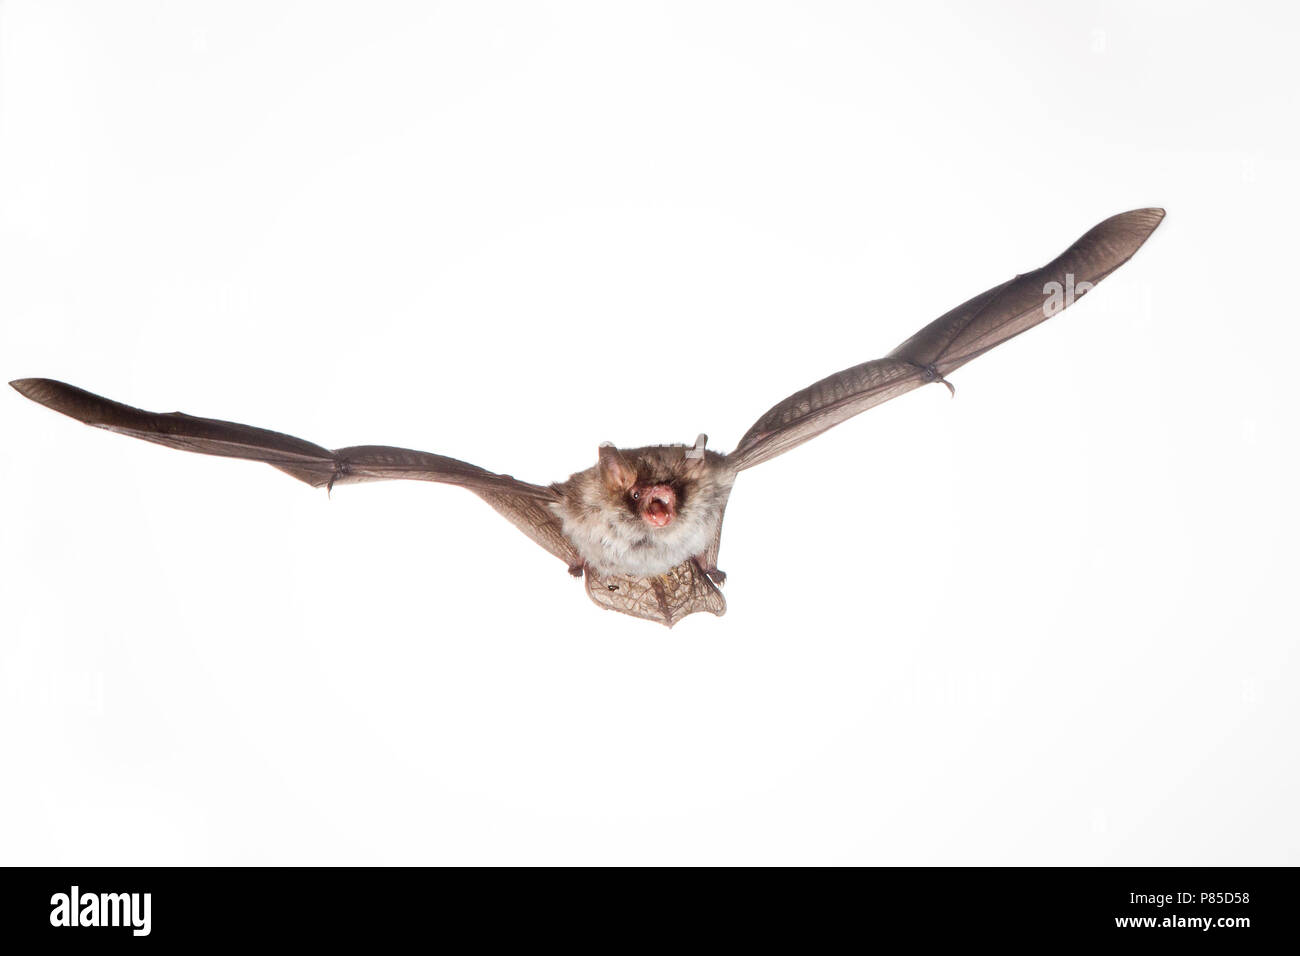 Franjestaart vliegend, Natterer's bat flying - Stock Image